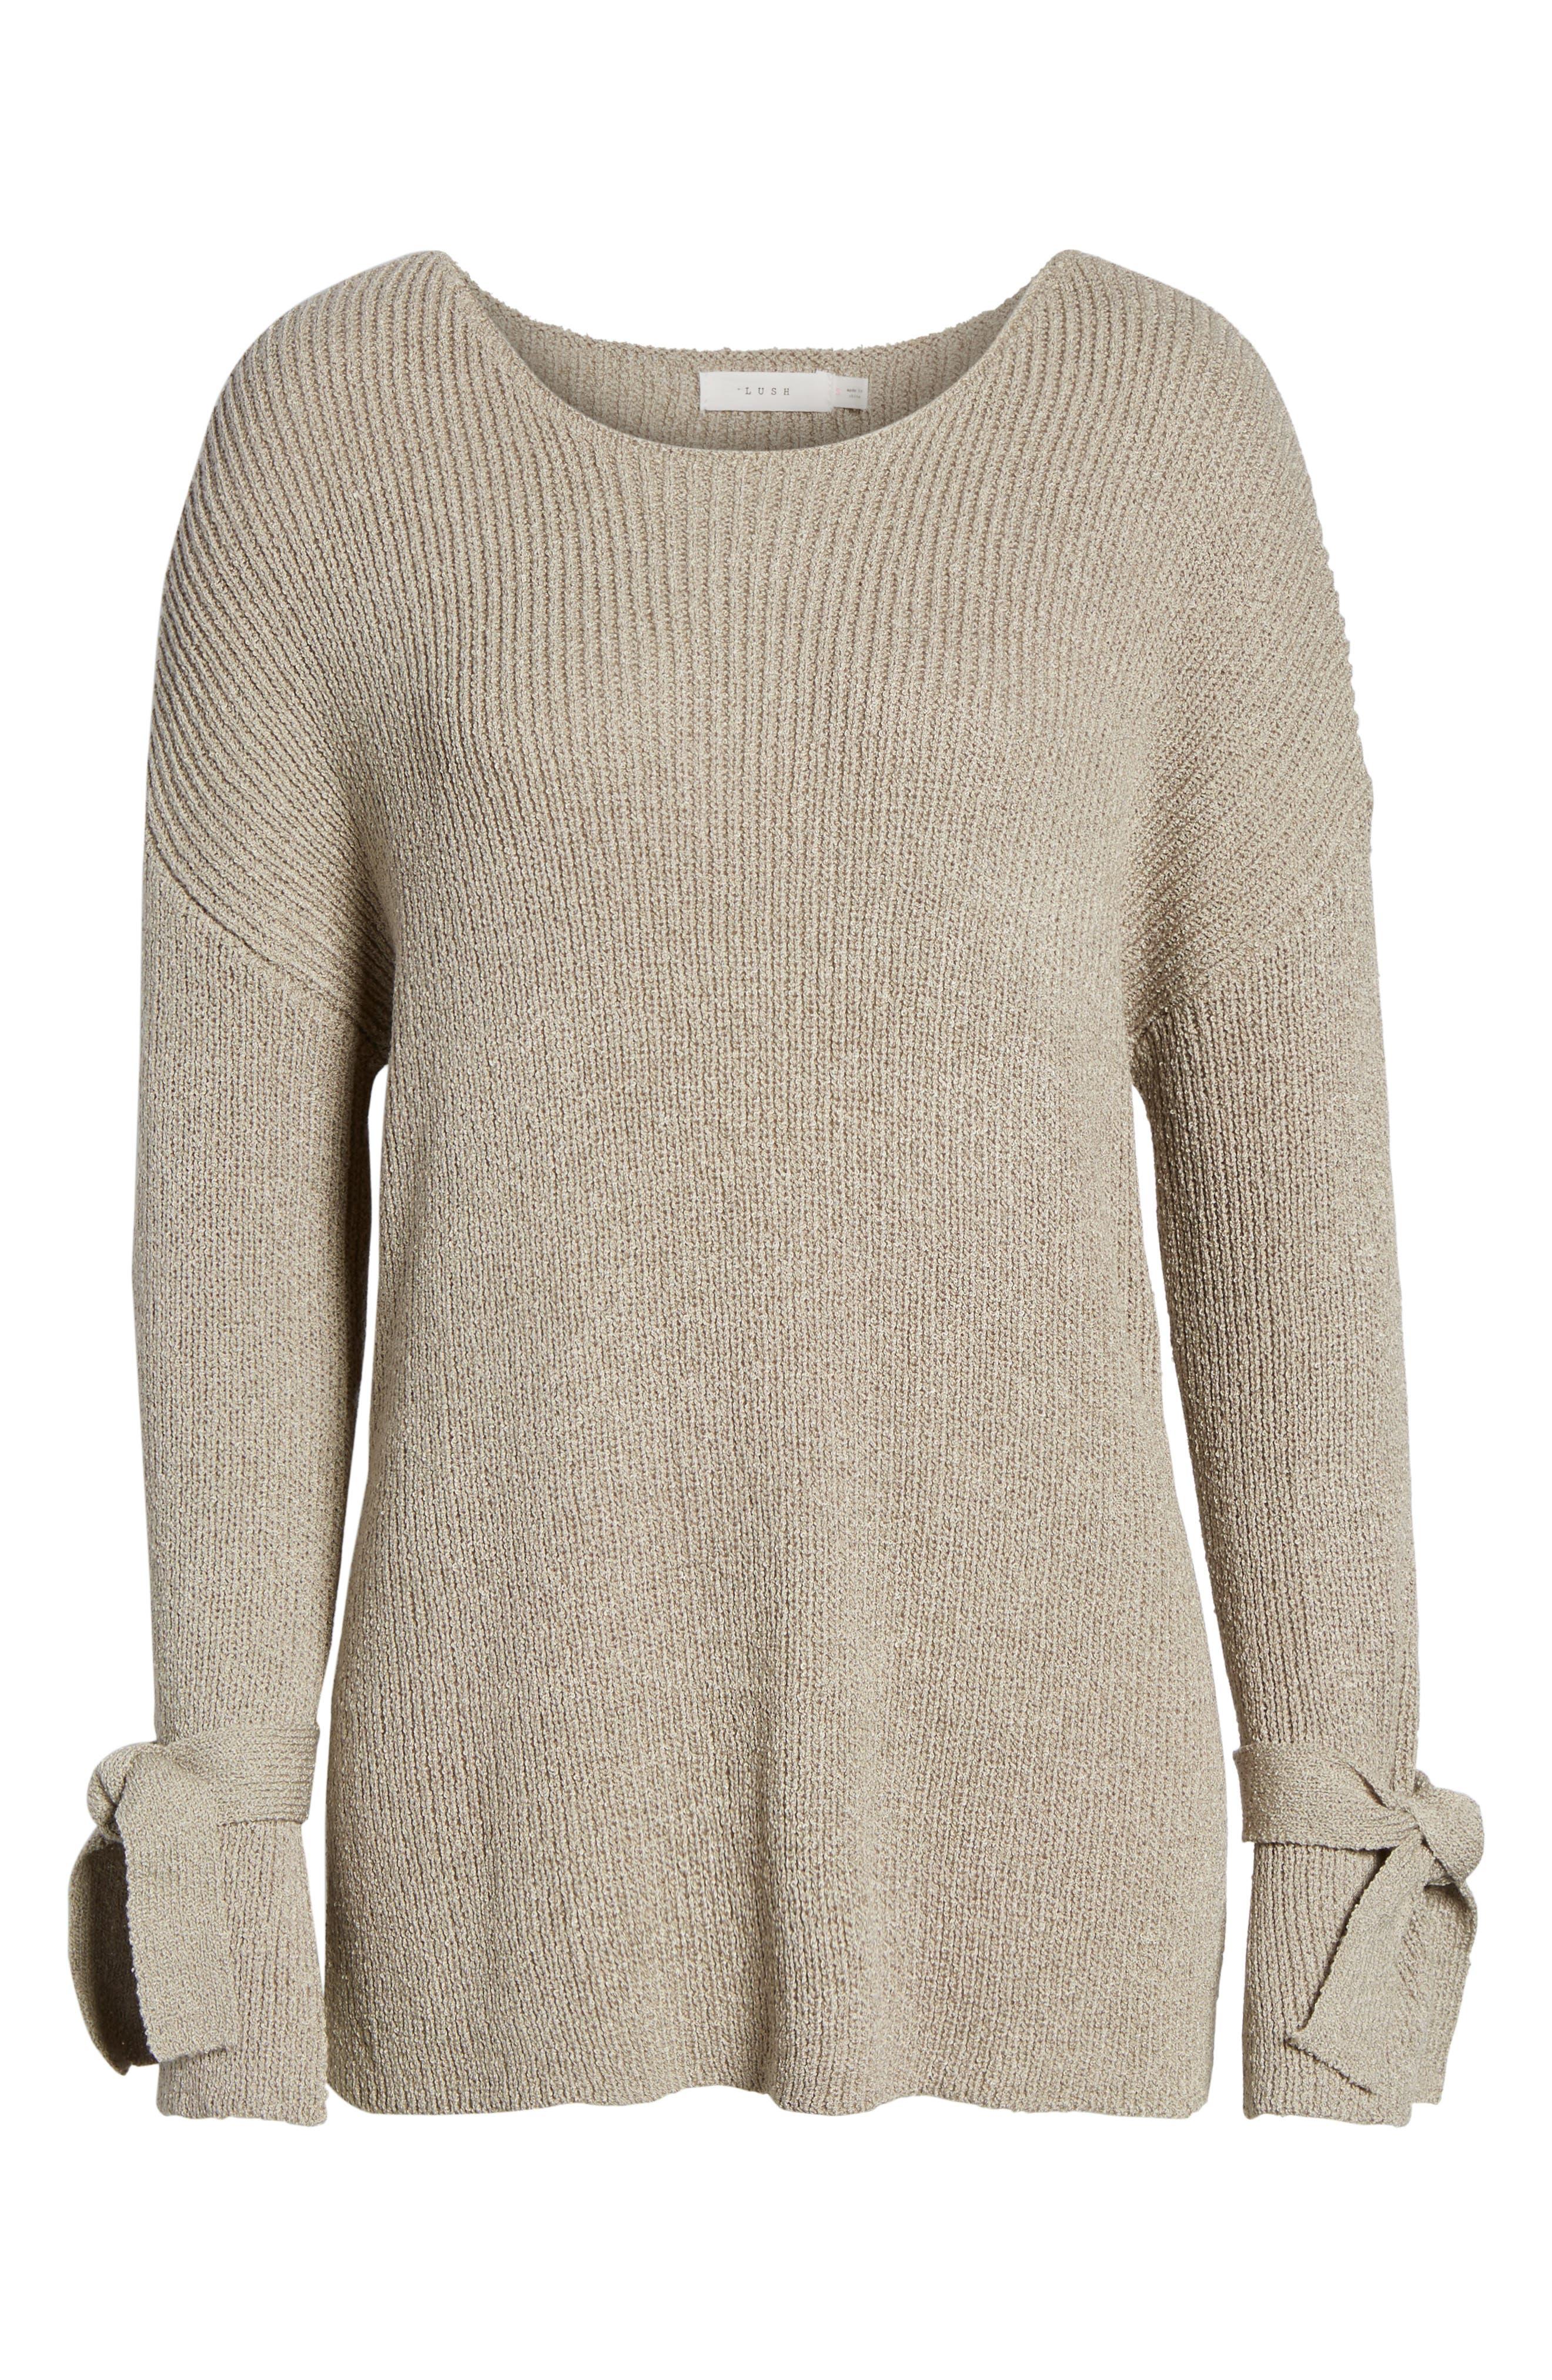 Tie Sleeve Sweater,                             Alternate thumbnail 6, color,                             268